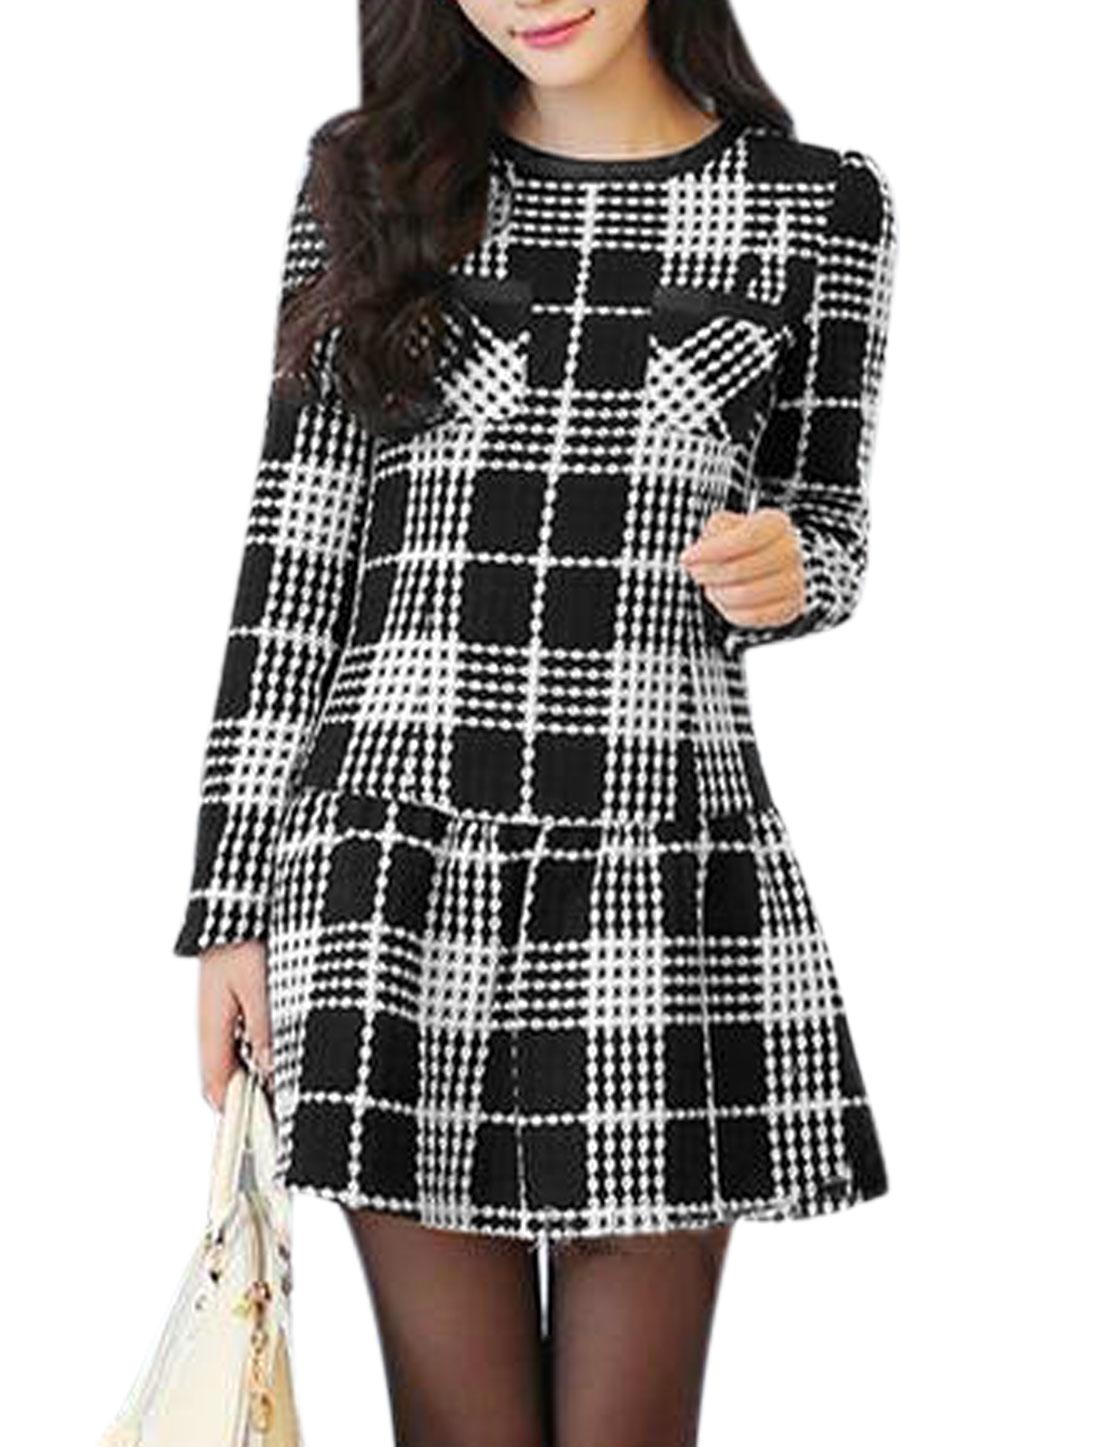 Lady Round Neck Long Sleeve Plaids Casual Tunic Dress Black White M